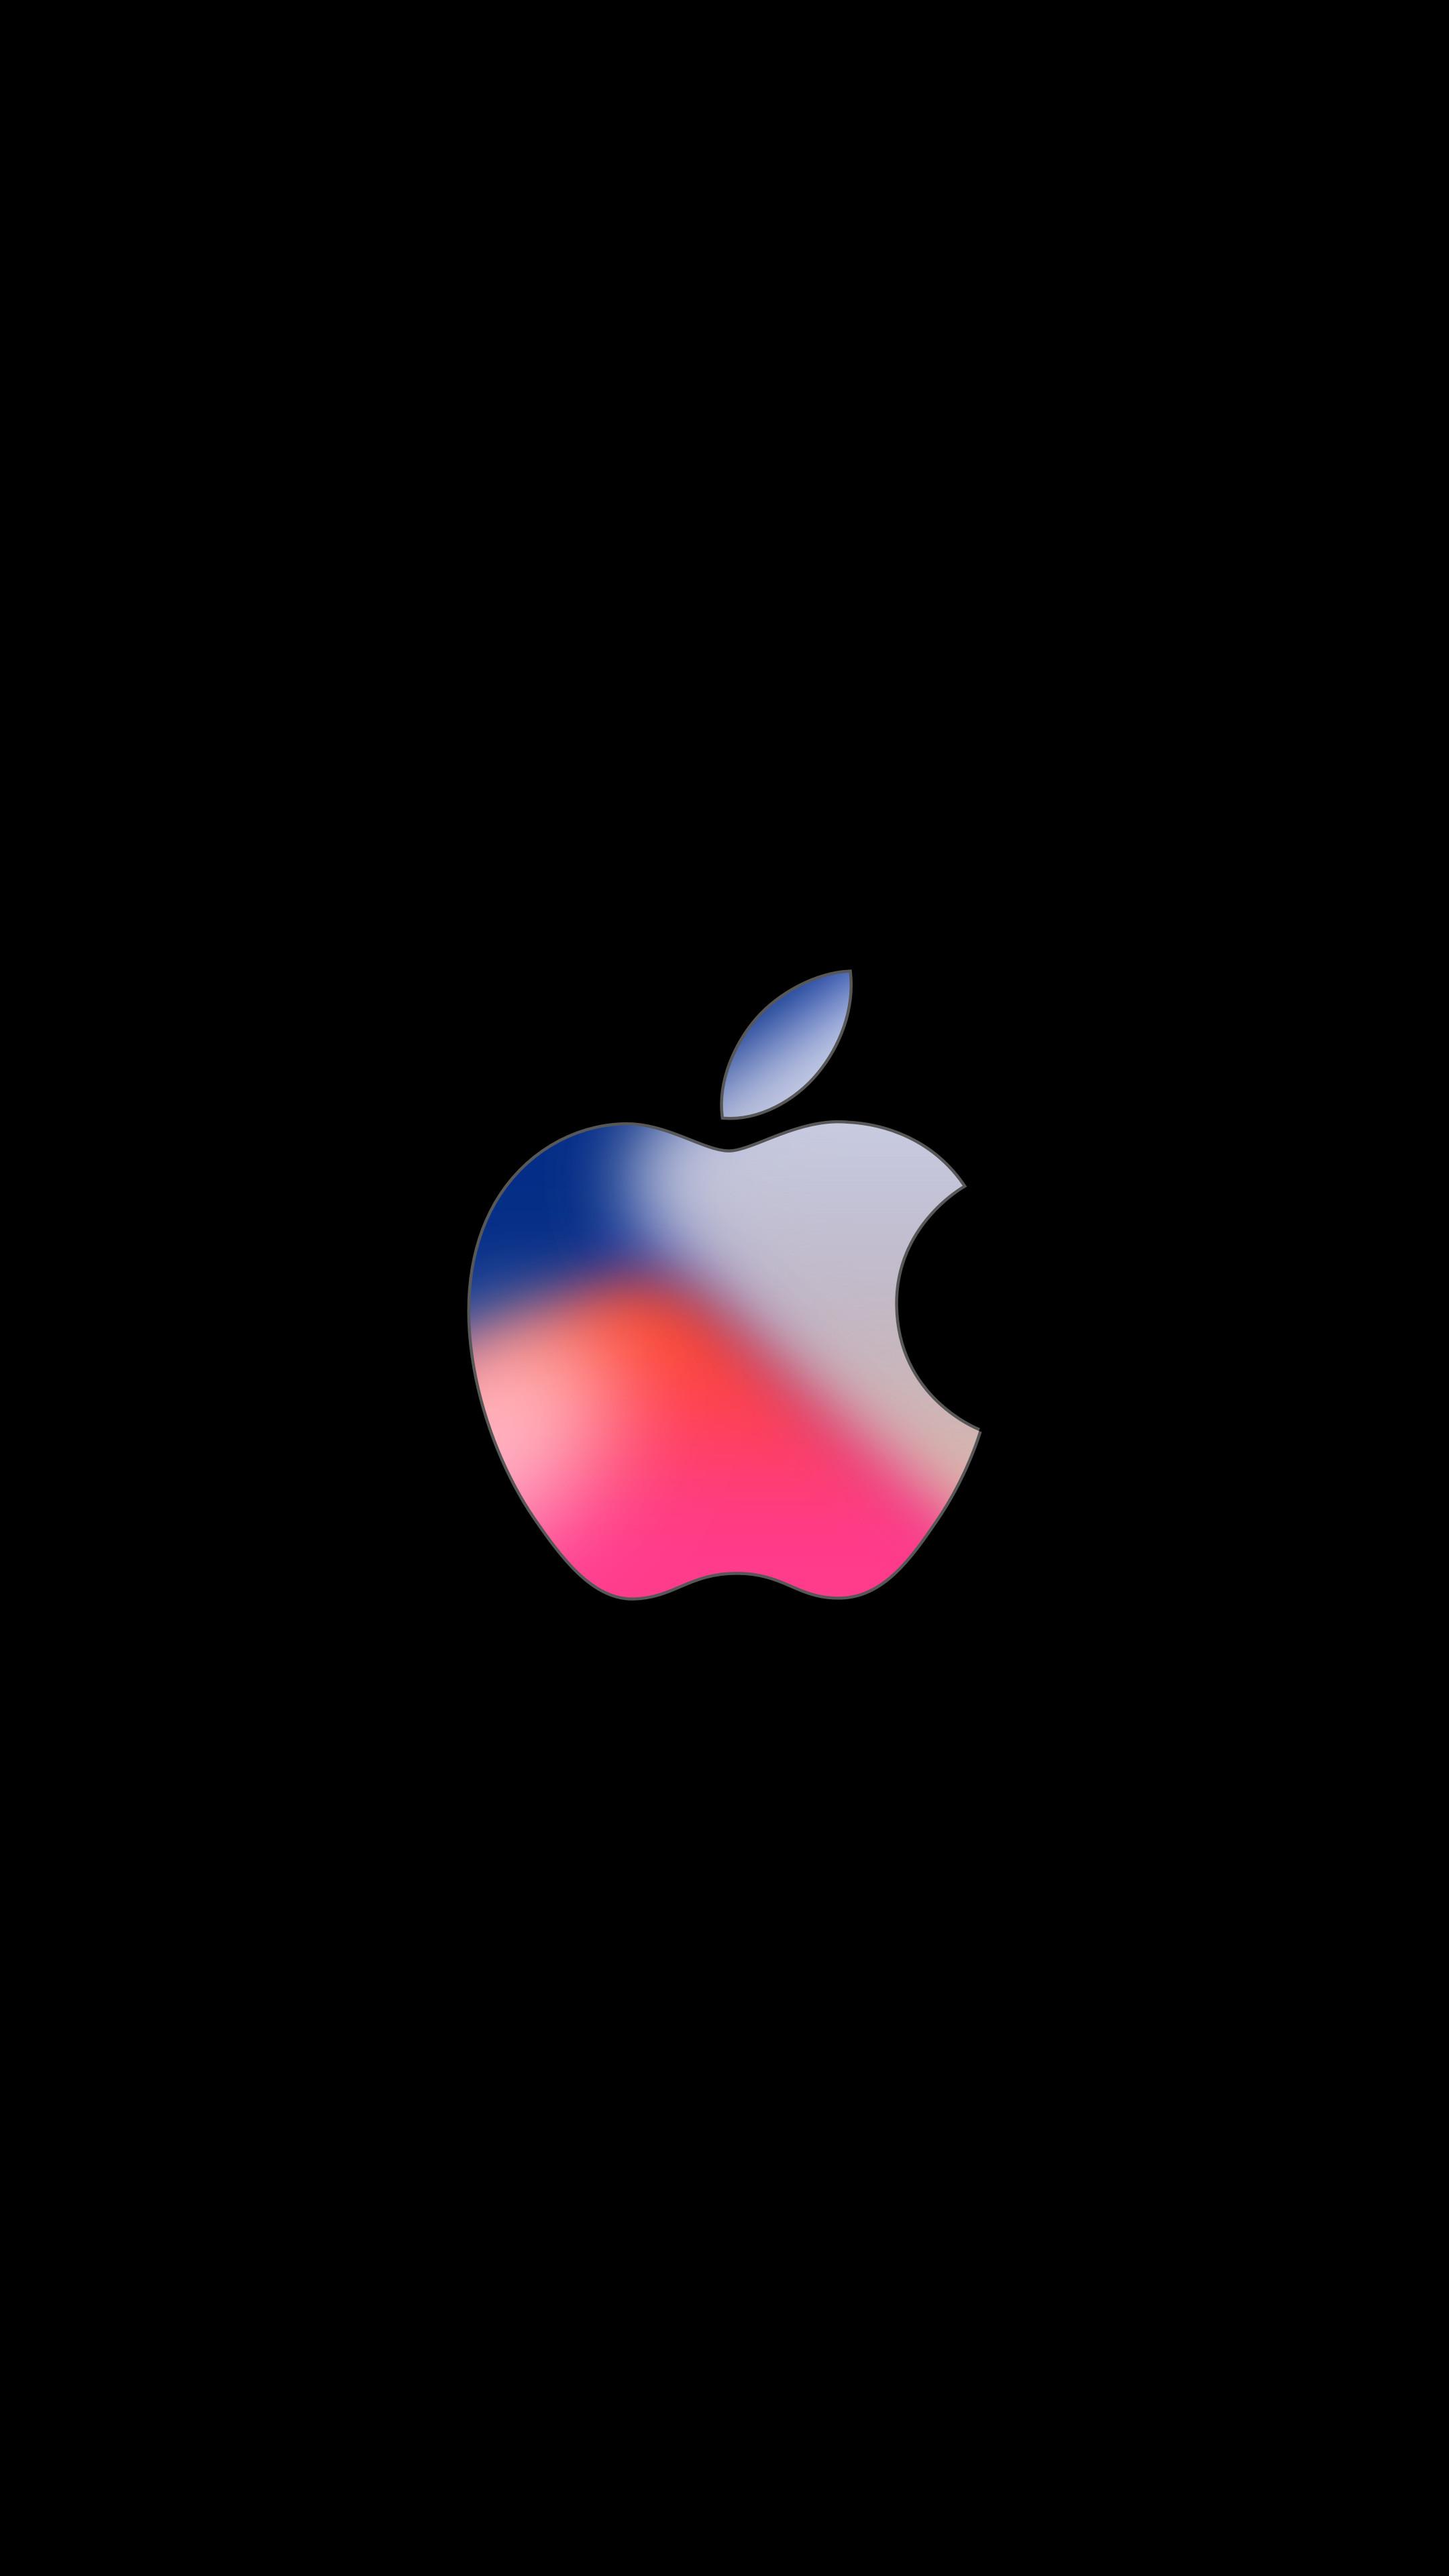 Mac Logo Wallpaper 77 Pictures